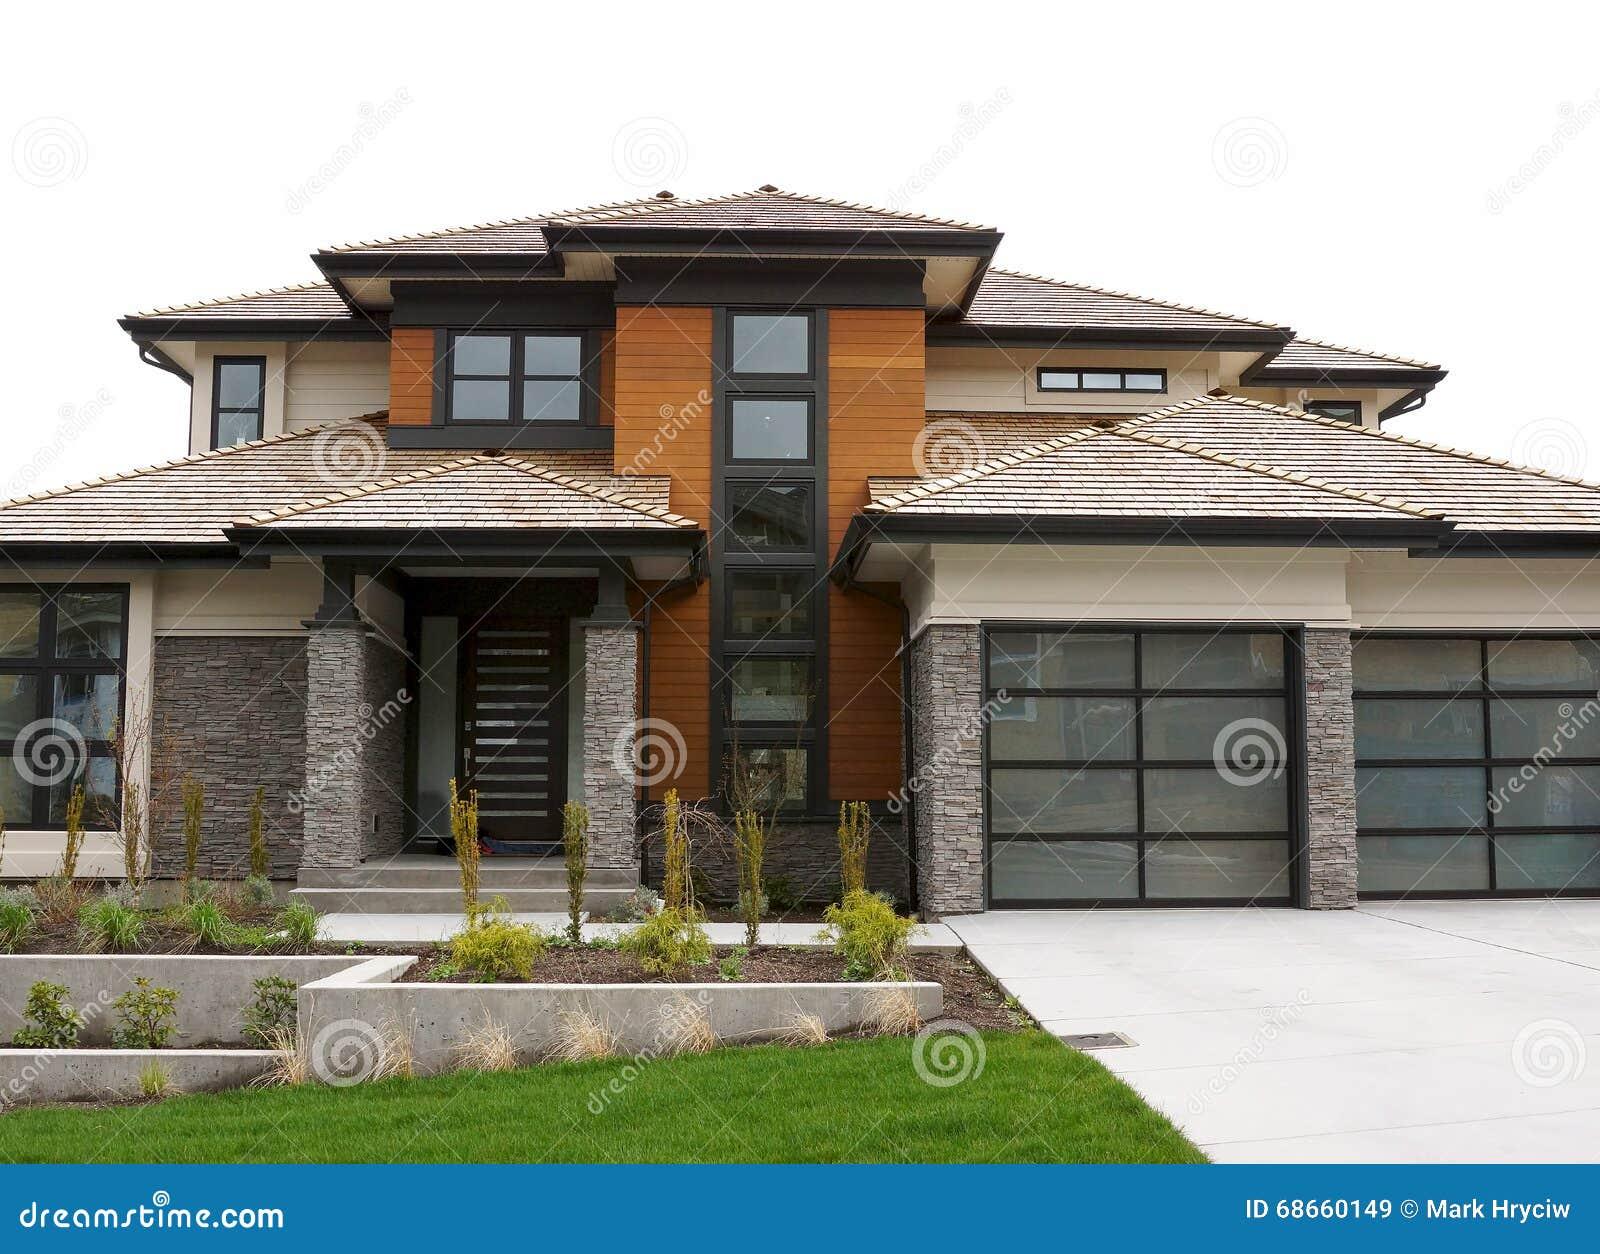 New large custom home exterior stock photo image 68660149 for Custom home photos